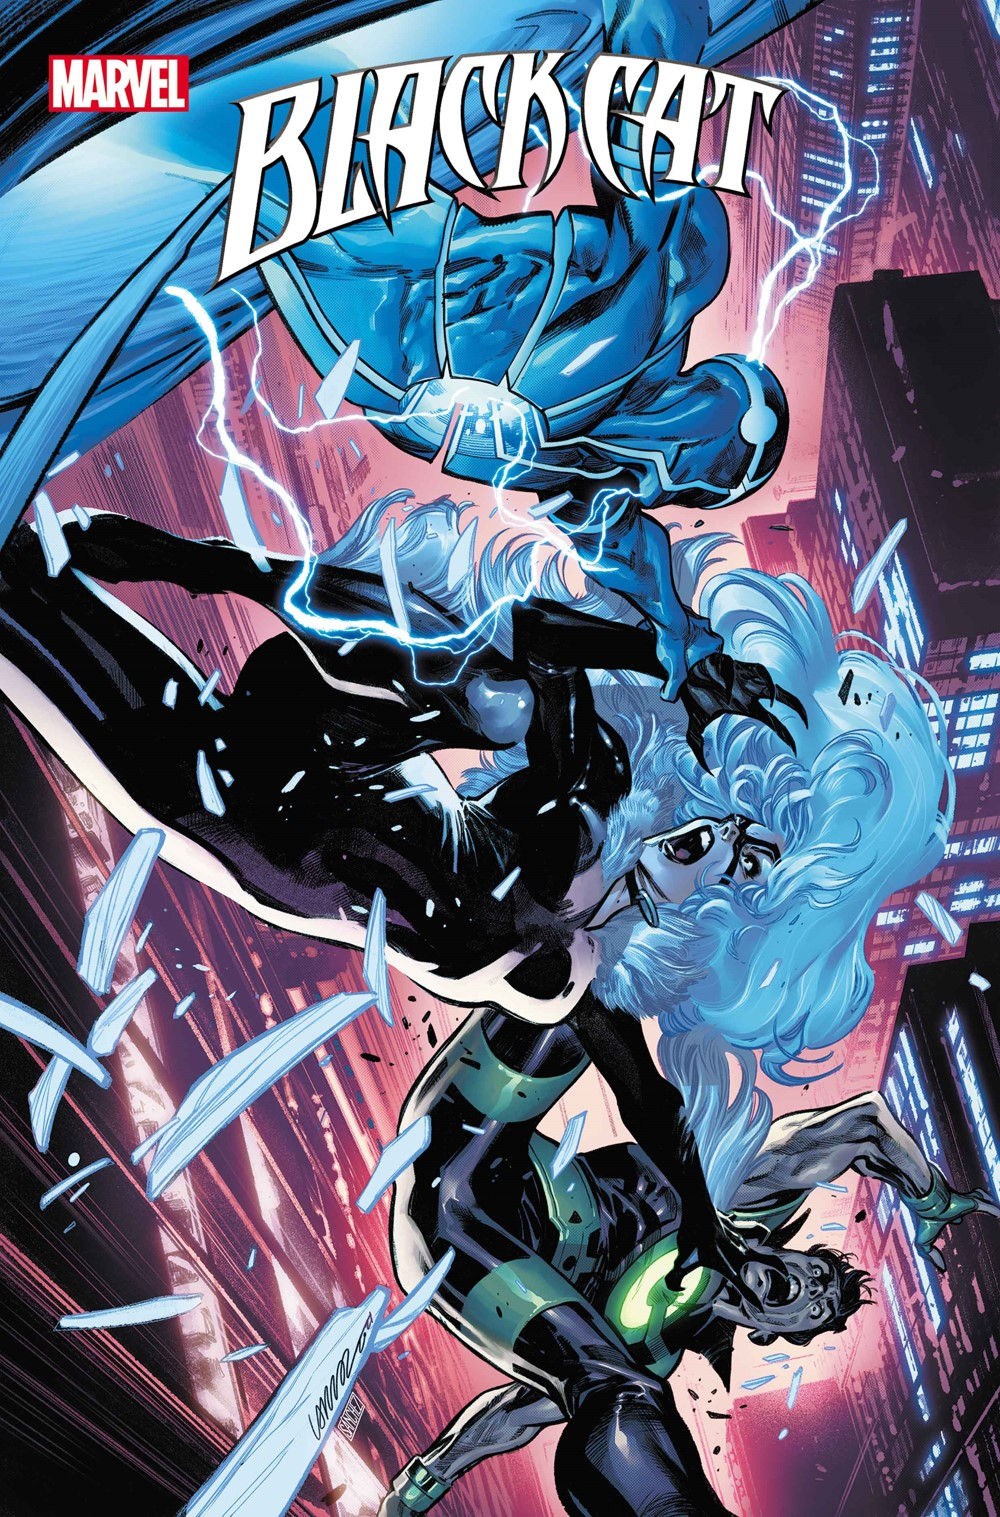 BLACKCAT2020010_cov Marvel Comics September 2021 Solicitations